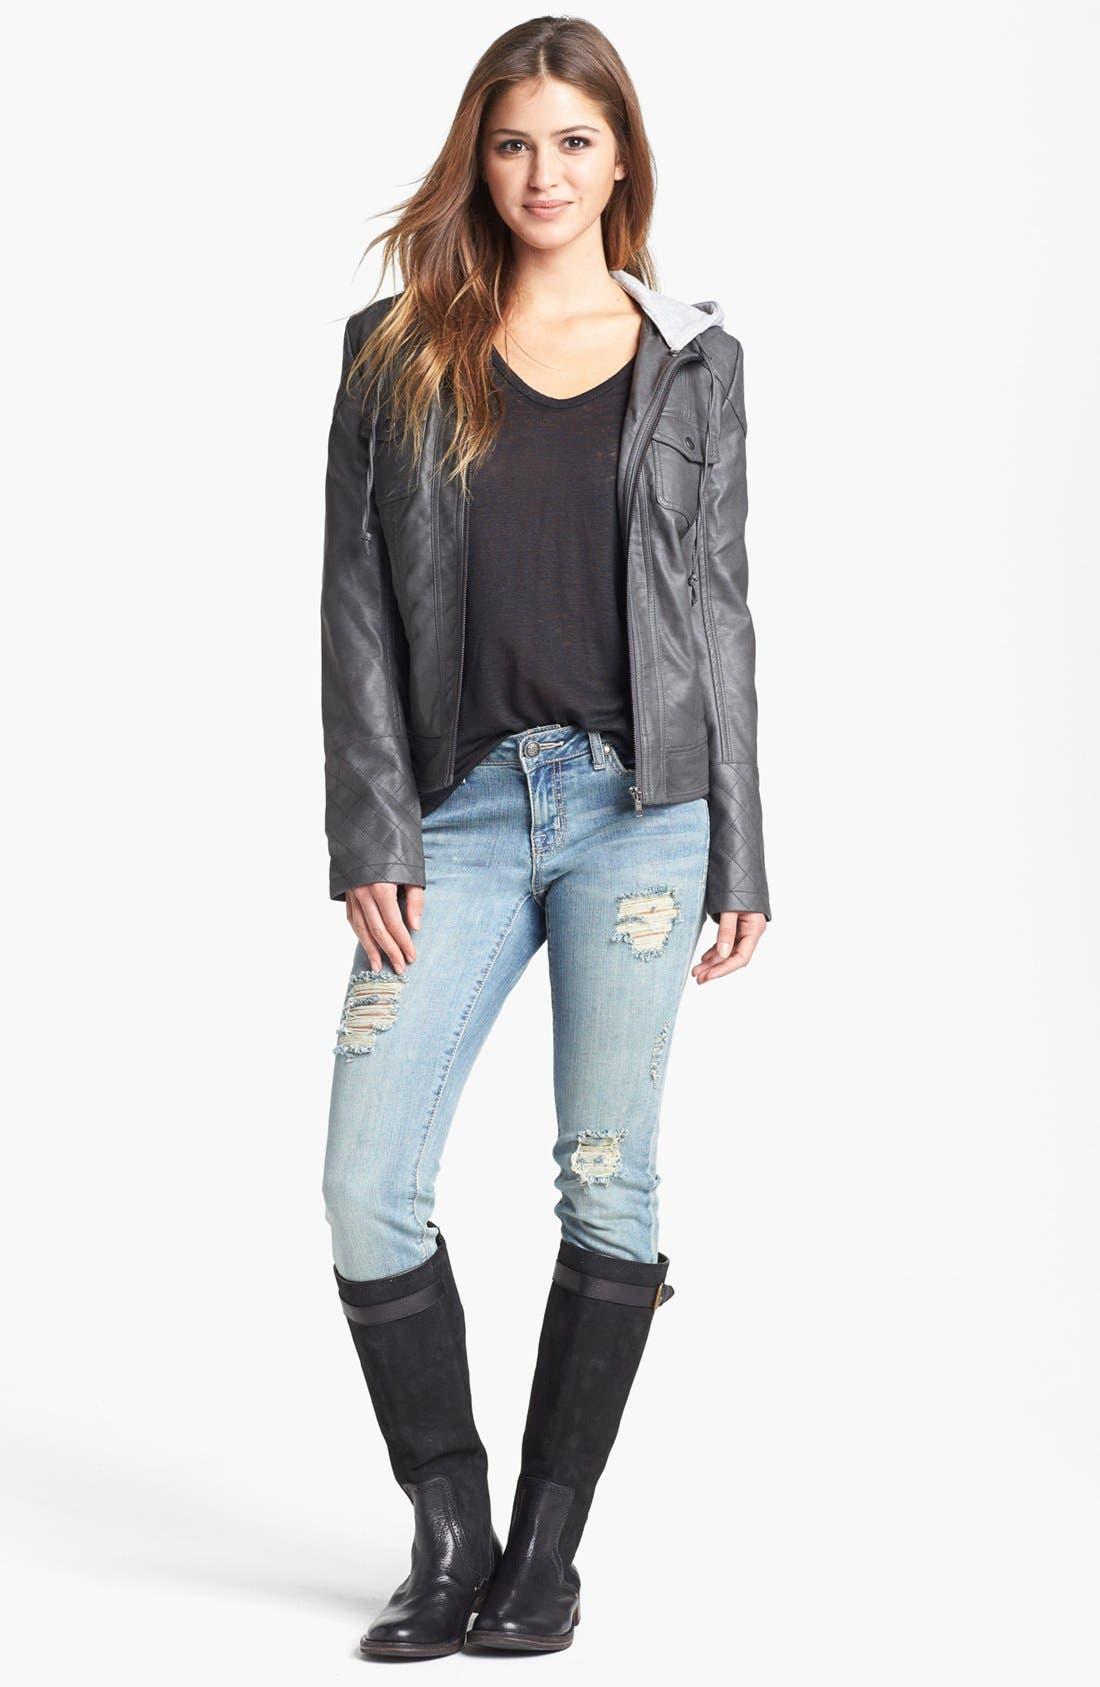 Main Image - Jessica Simpson 'Heathcliff' Hooded Faux Leather Jacket